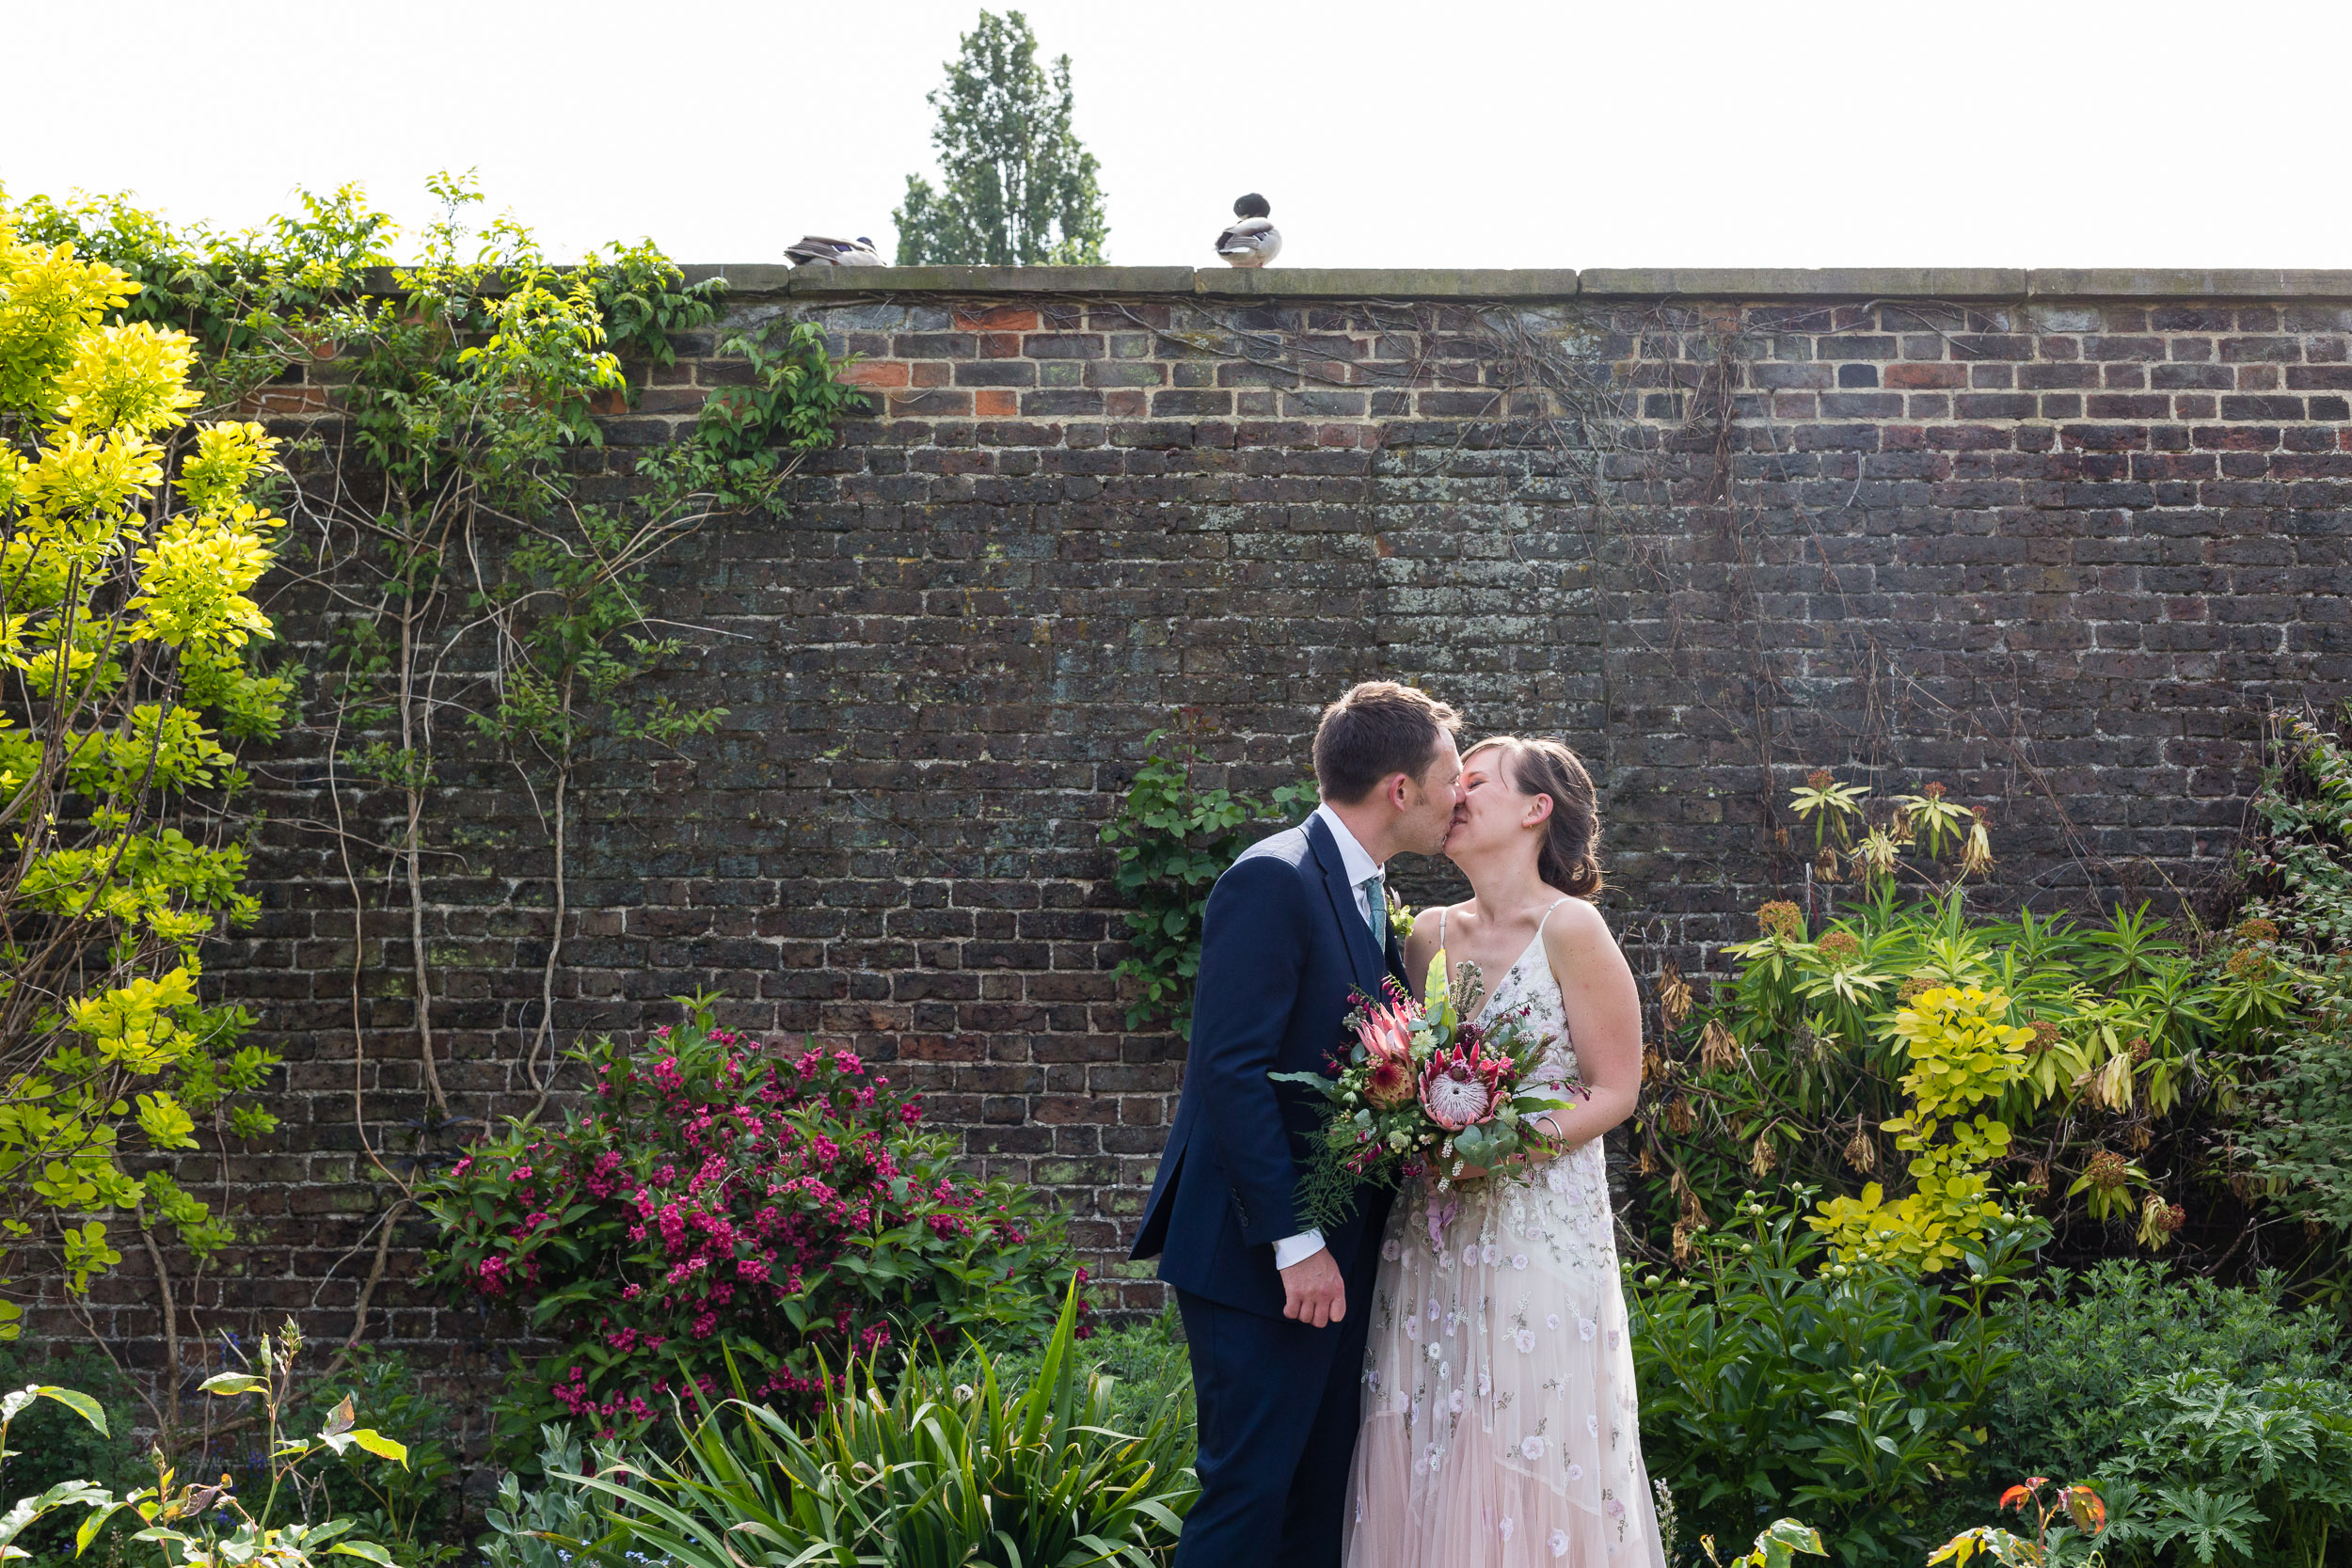 brockwell-lido-brixton-herne-hill-wedding-273.jpg